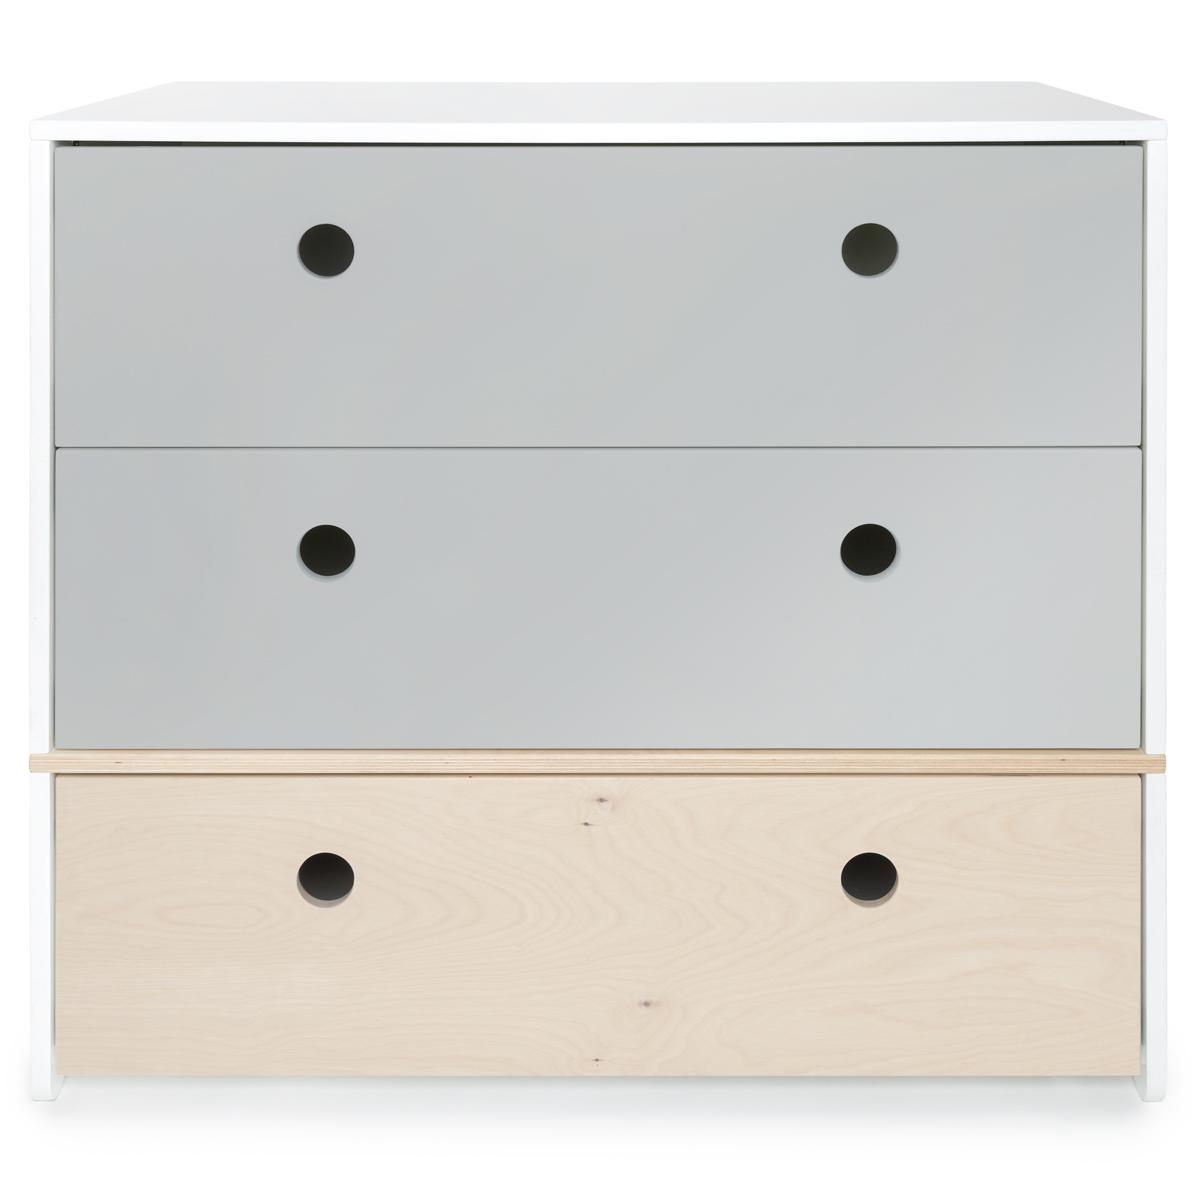 Kommode COLORFLEX Schubladen Farben pearl grey-pearl grey-white wash